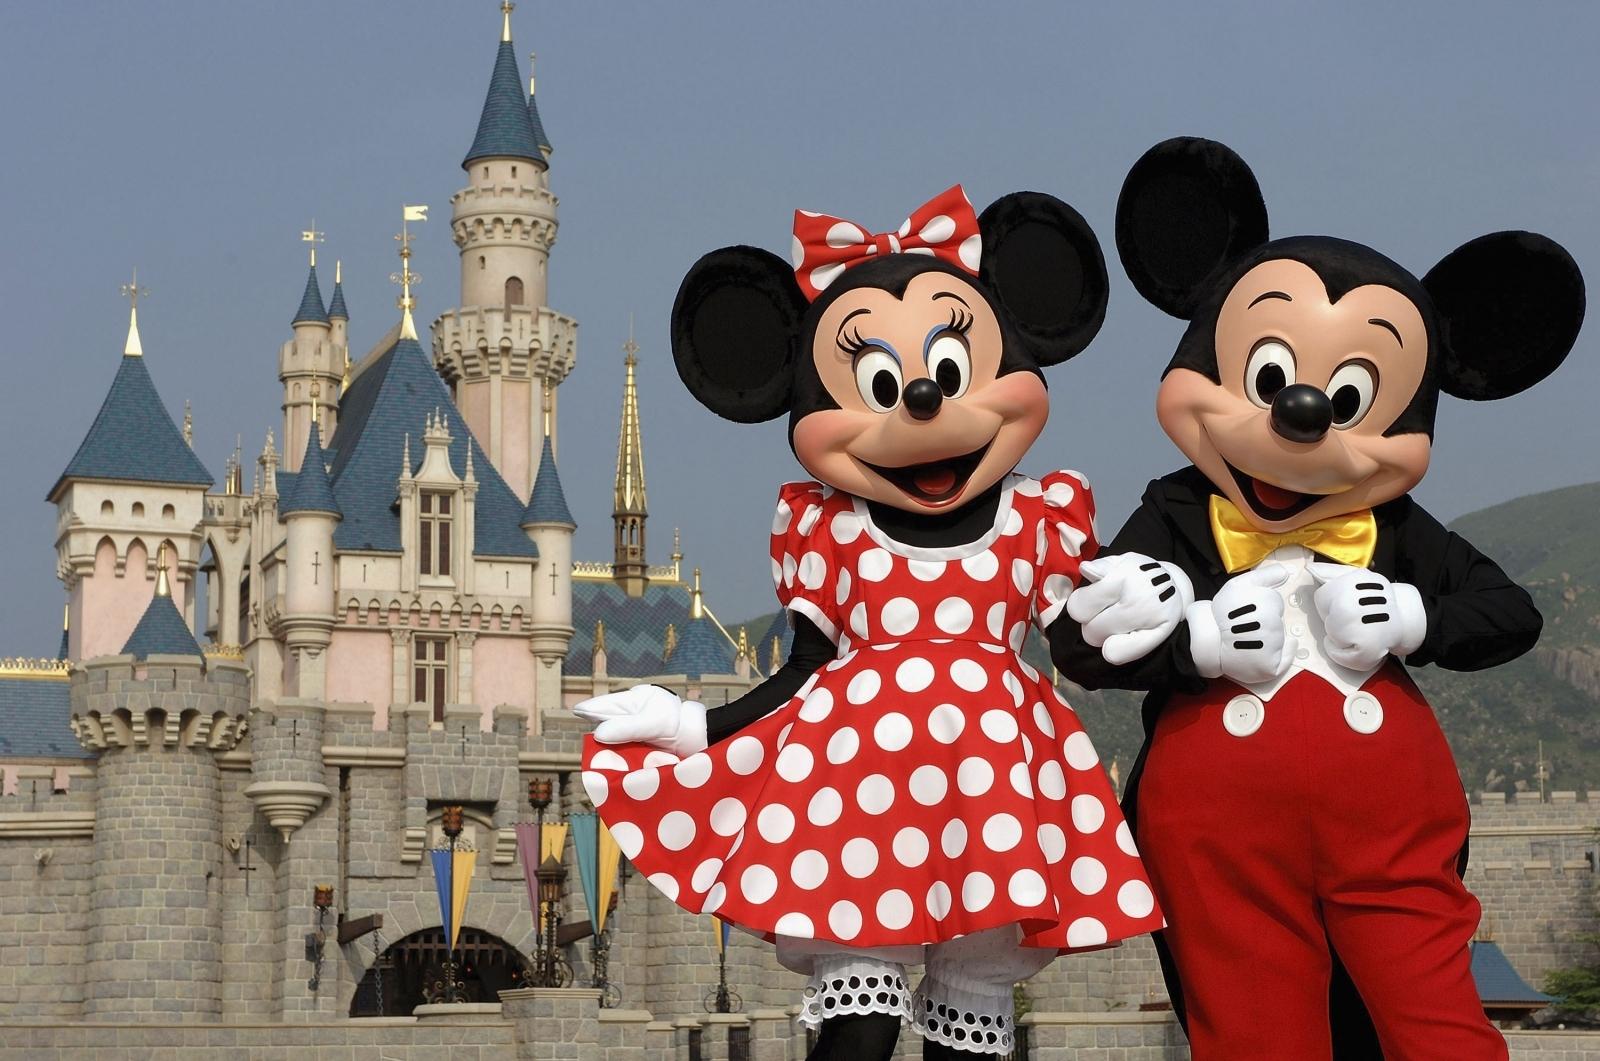 Minnie and Mickey at Disneyland